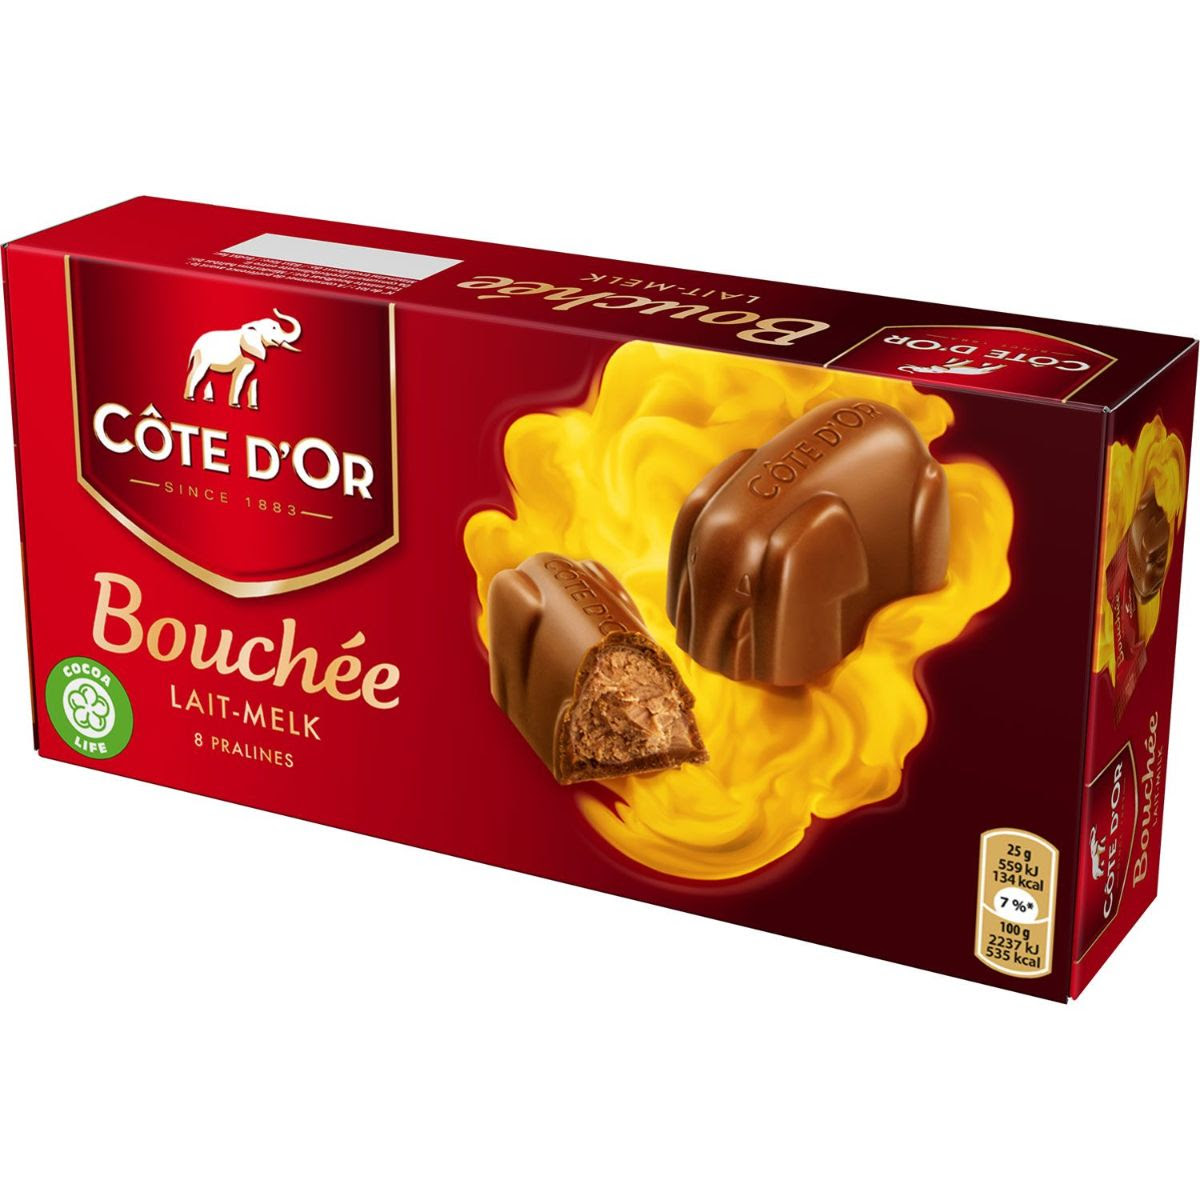 Cote D'or Bouchee Milk 8 Pack 200g